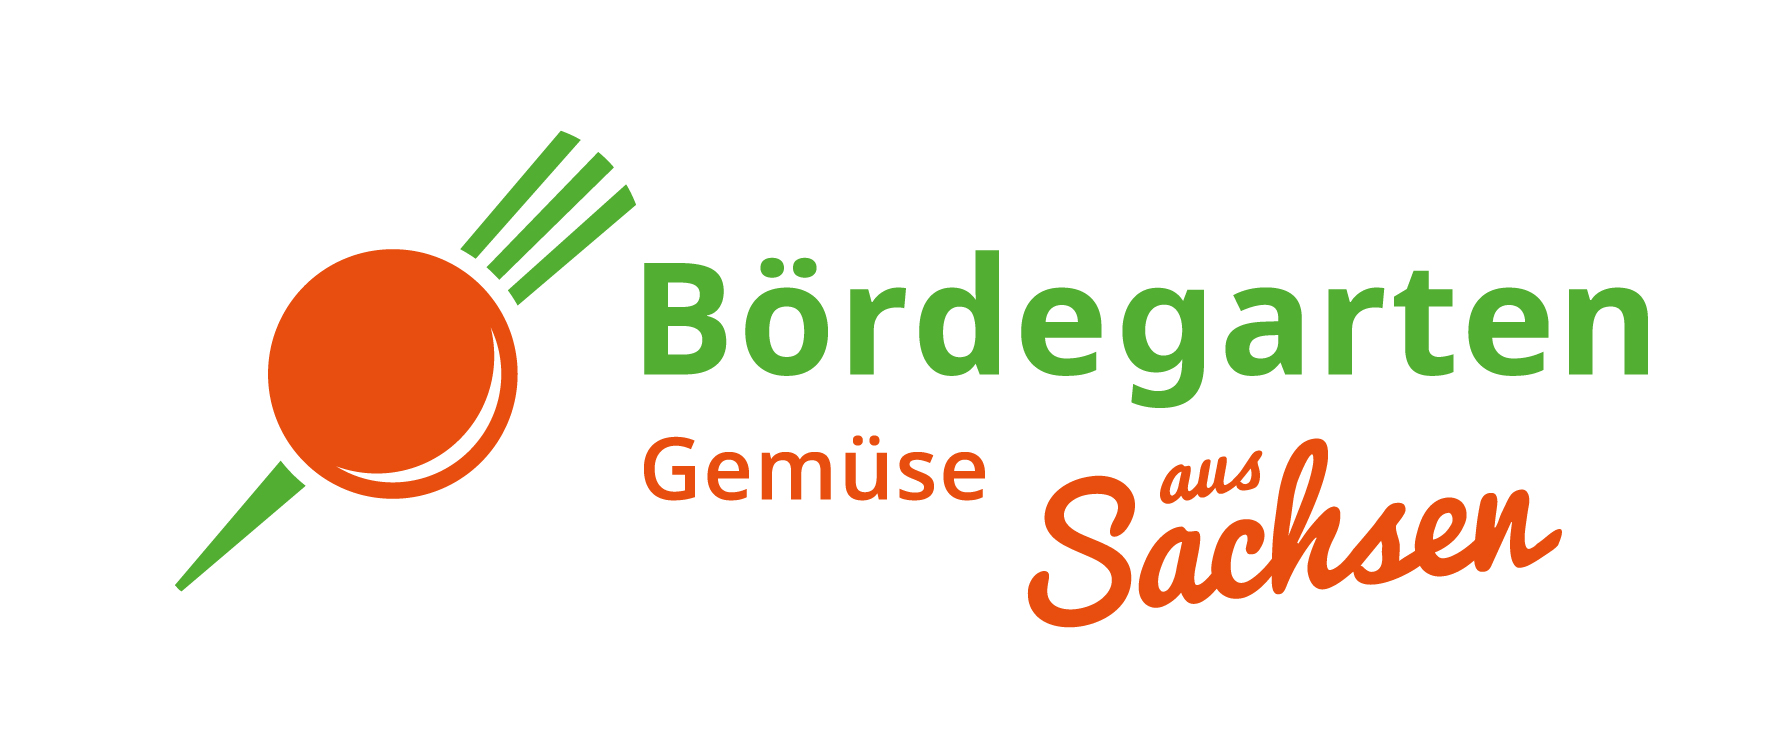 Bördegarten-Sachsen